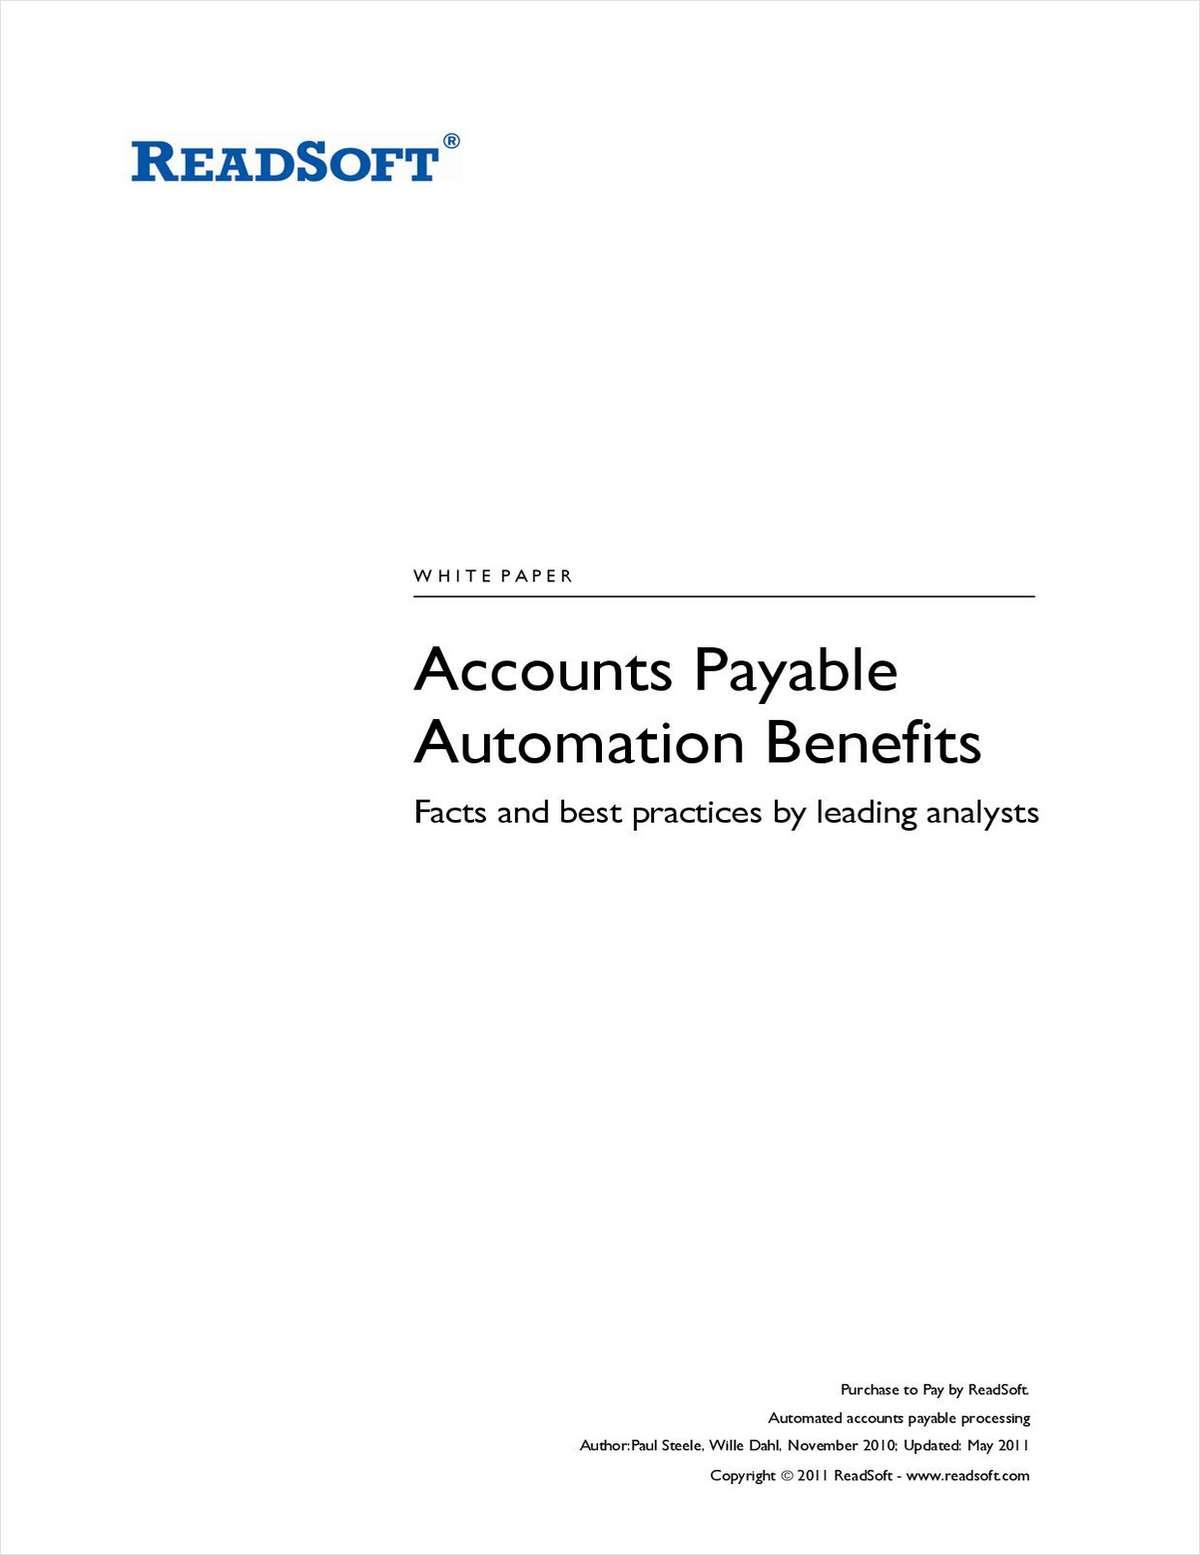 Accounts Payable Automation Benefits